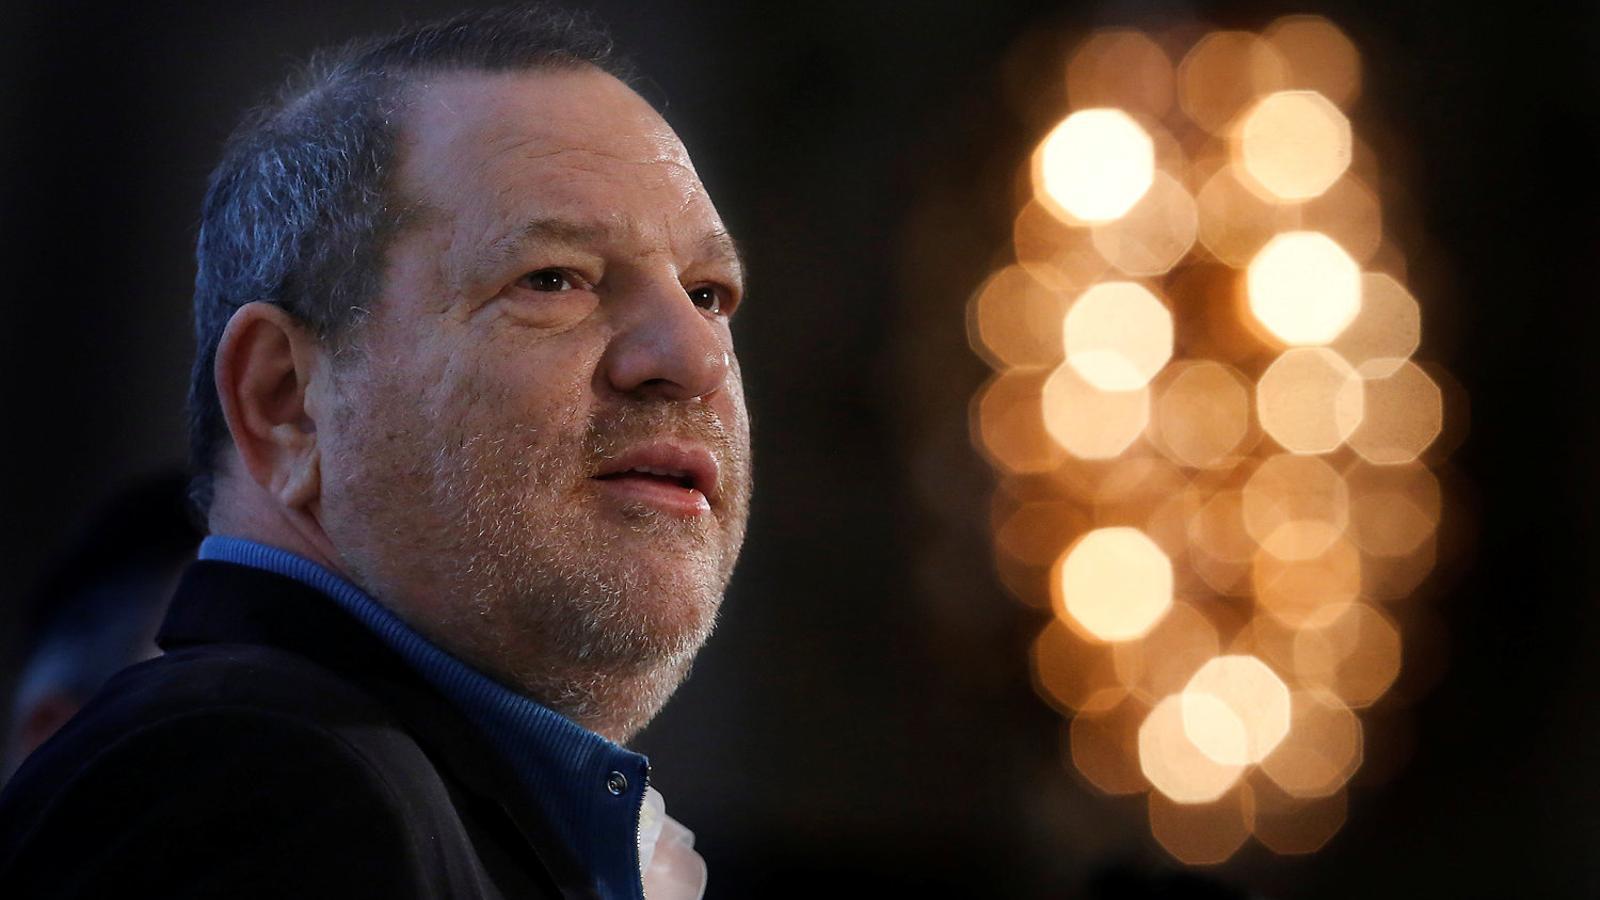 Harvey Weinstein, gegant del cinema, ha sigut acusat de nombroses agressions.